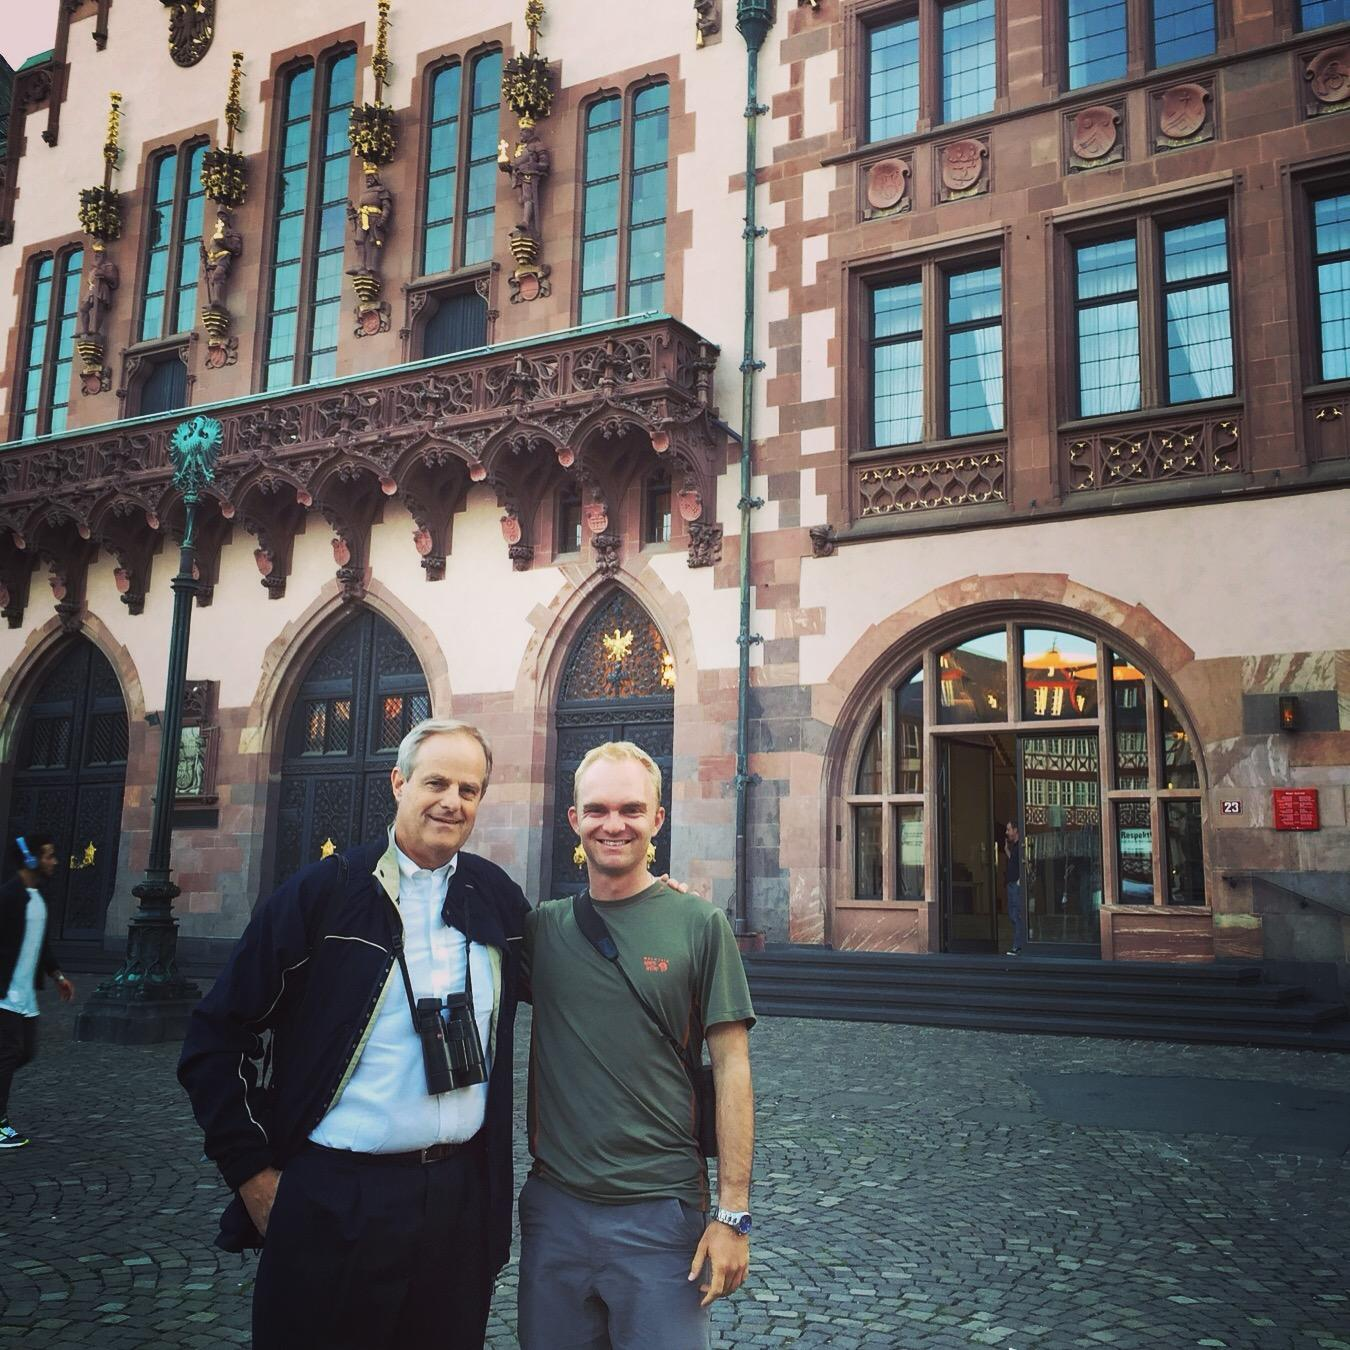 Peter Kaestner and Noah pause outside the Romer building in Frankfurt. Noak Strycker